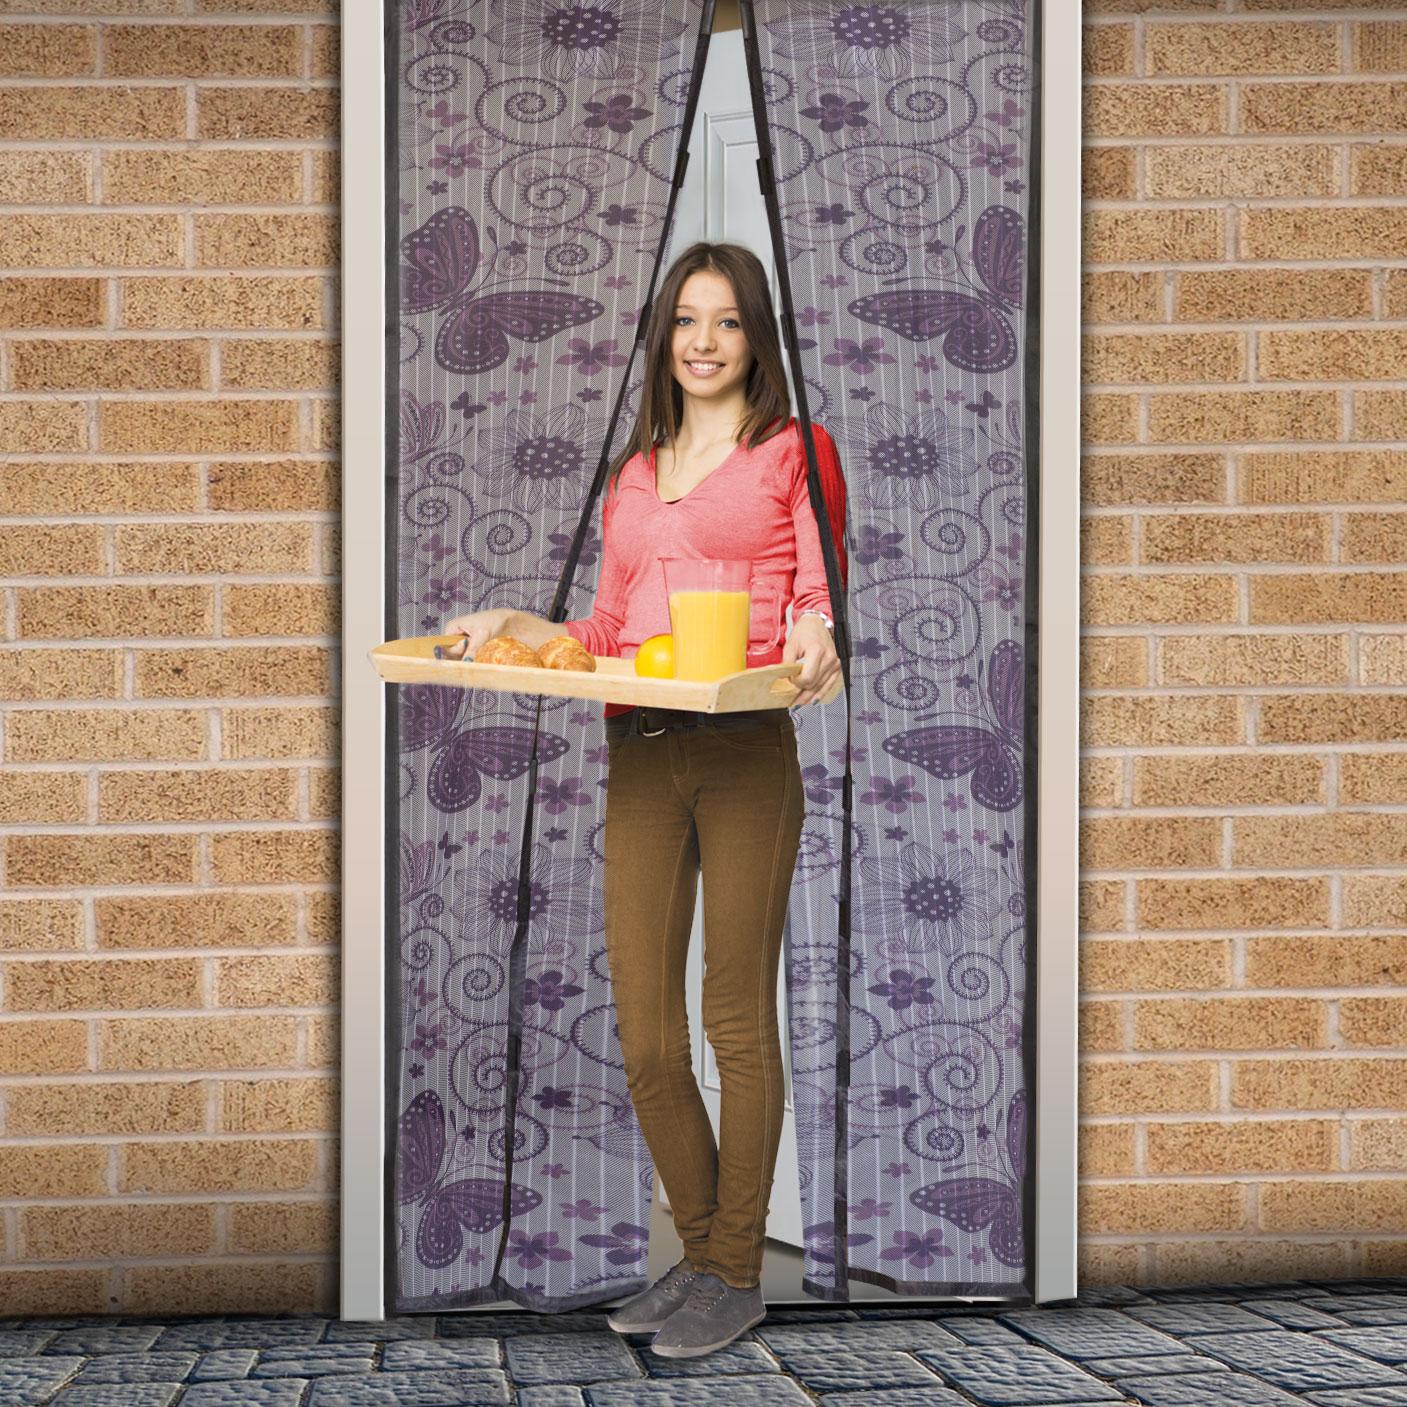 sz nyogh l sz nyogh l f gg ny ajt ra m gneses 100 x 210 cm lila pillang s ft rt. Black Bedroom Furniture Sets. Home Design Ideas